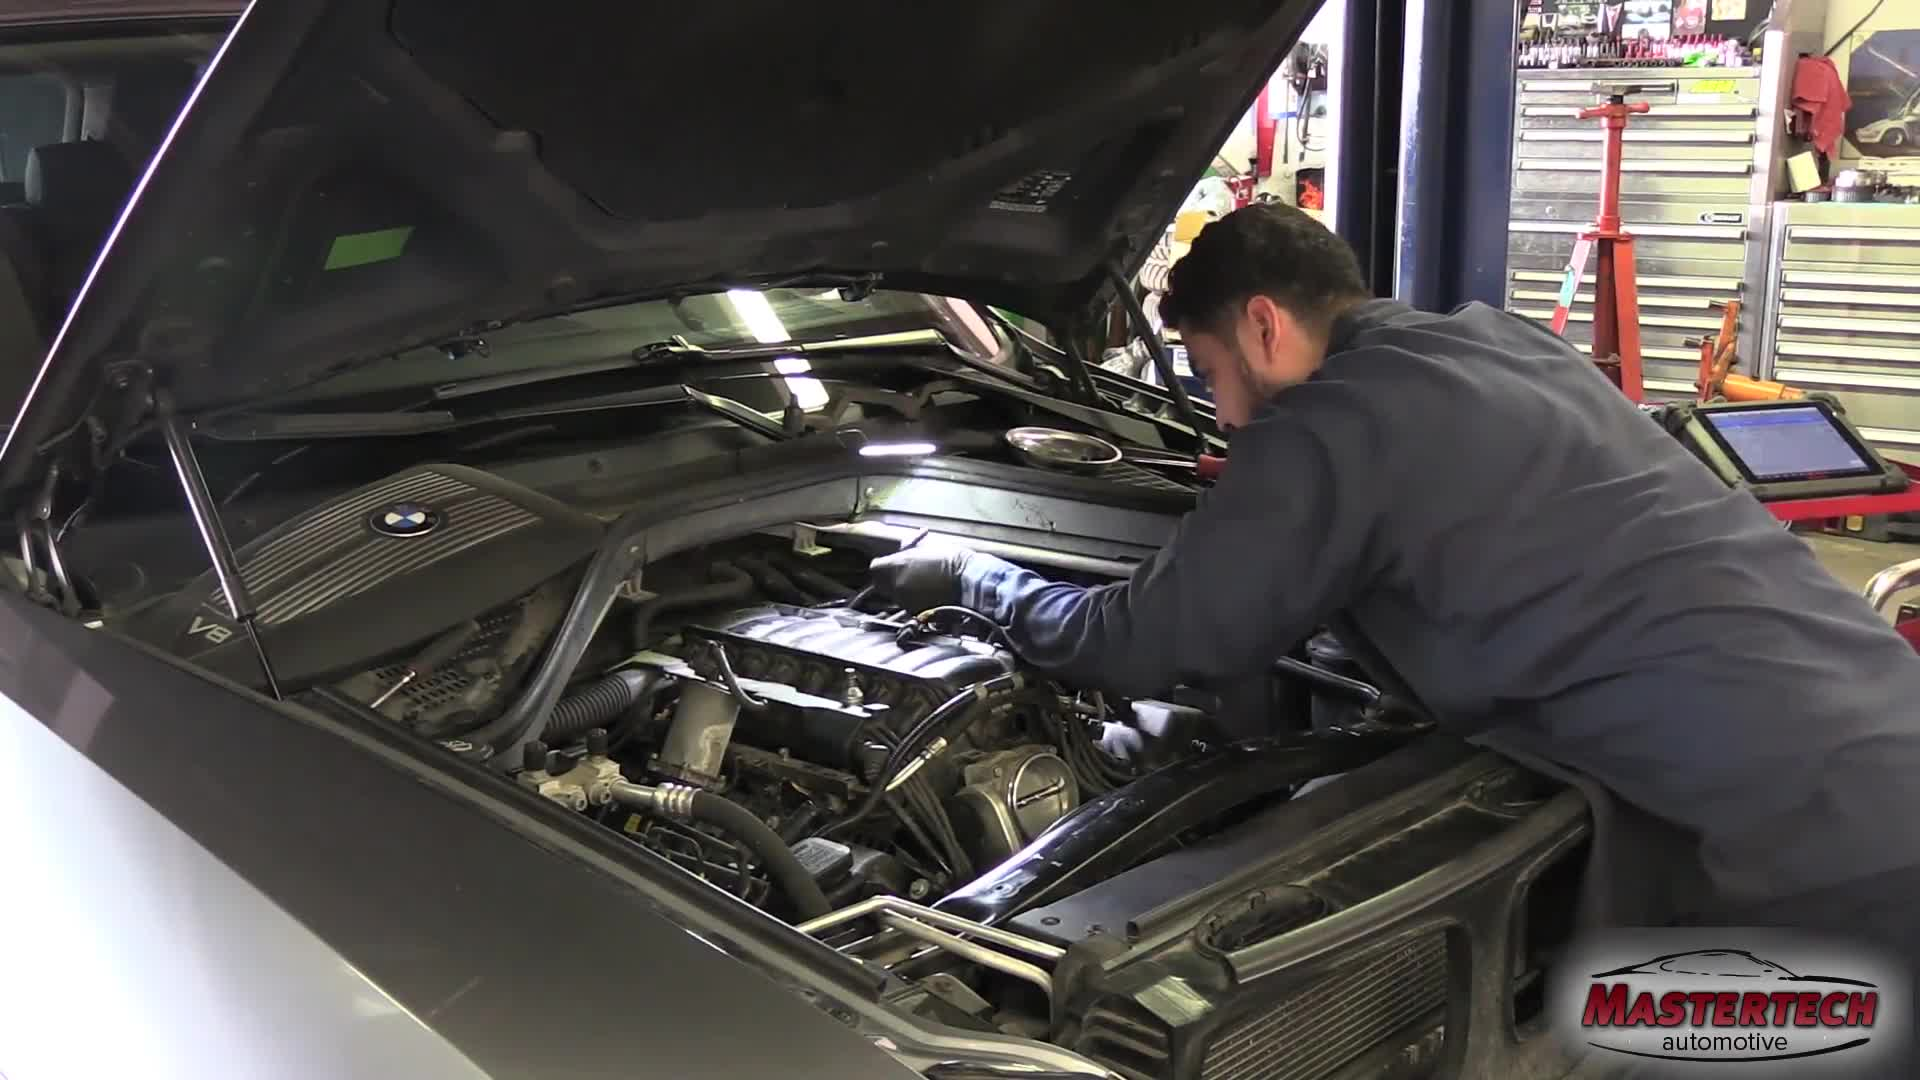 write engine car colt mitsubishi up guru clean mucky mechanic bay cleaning dirty